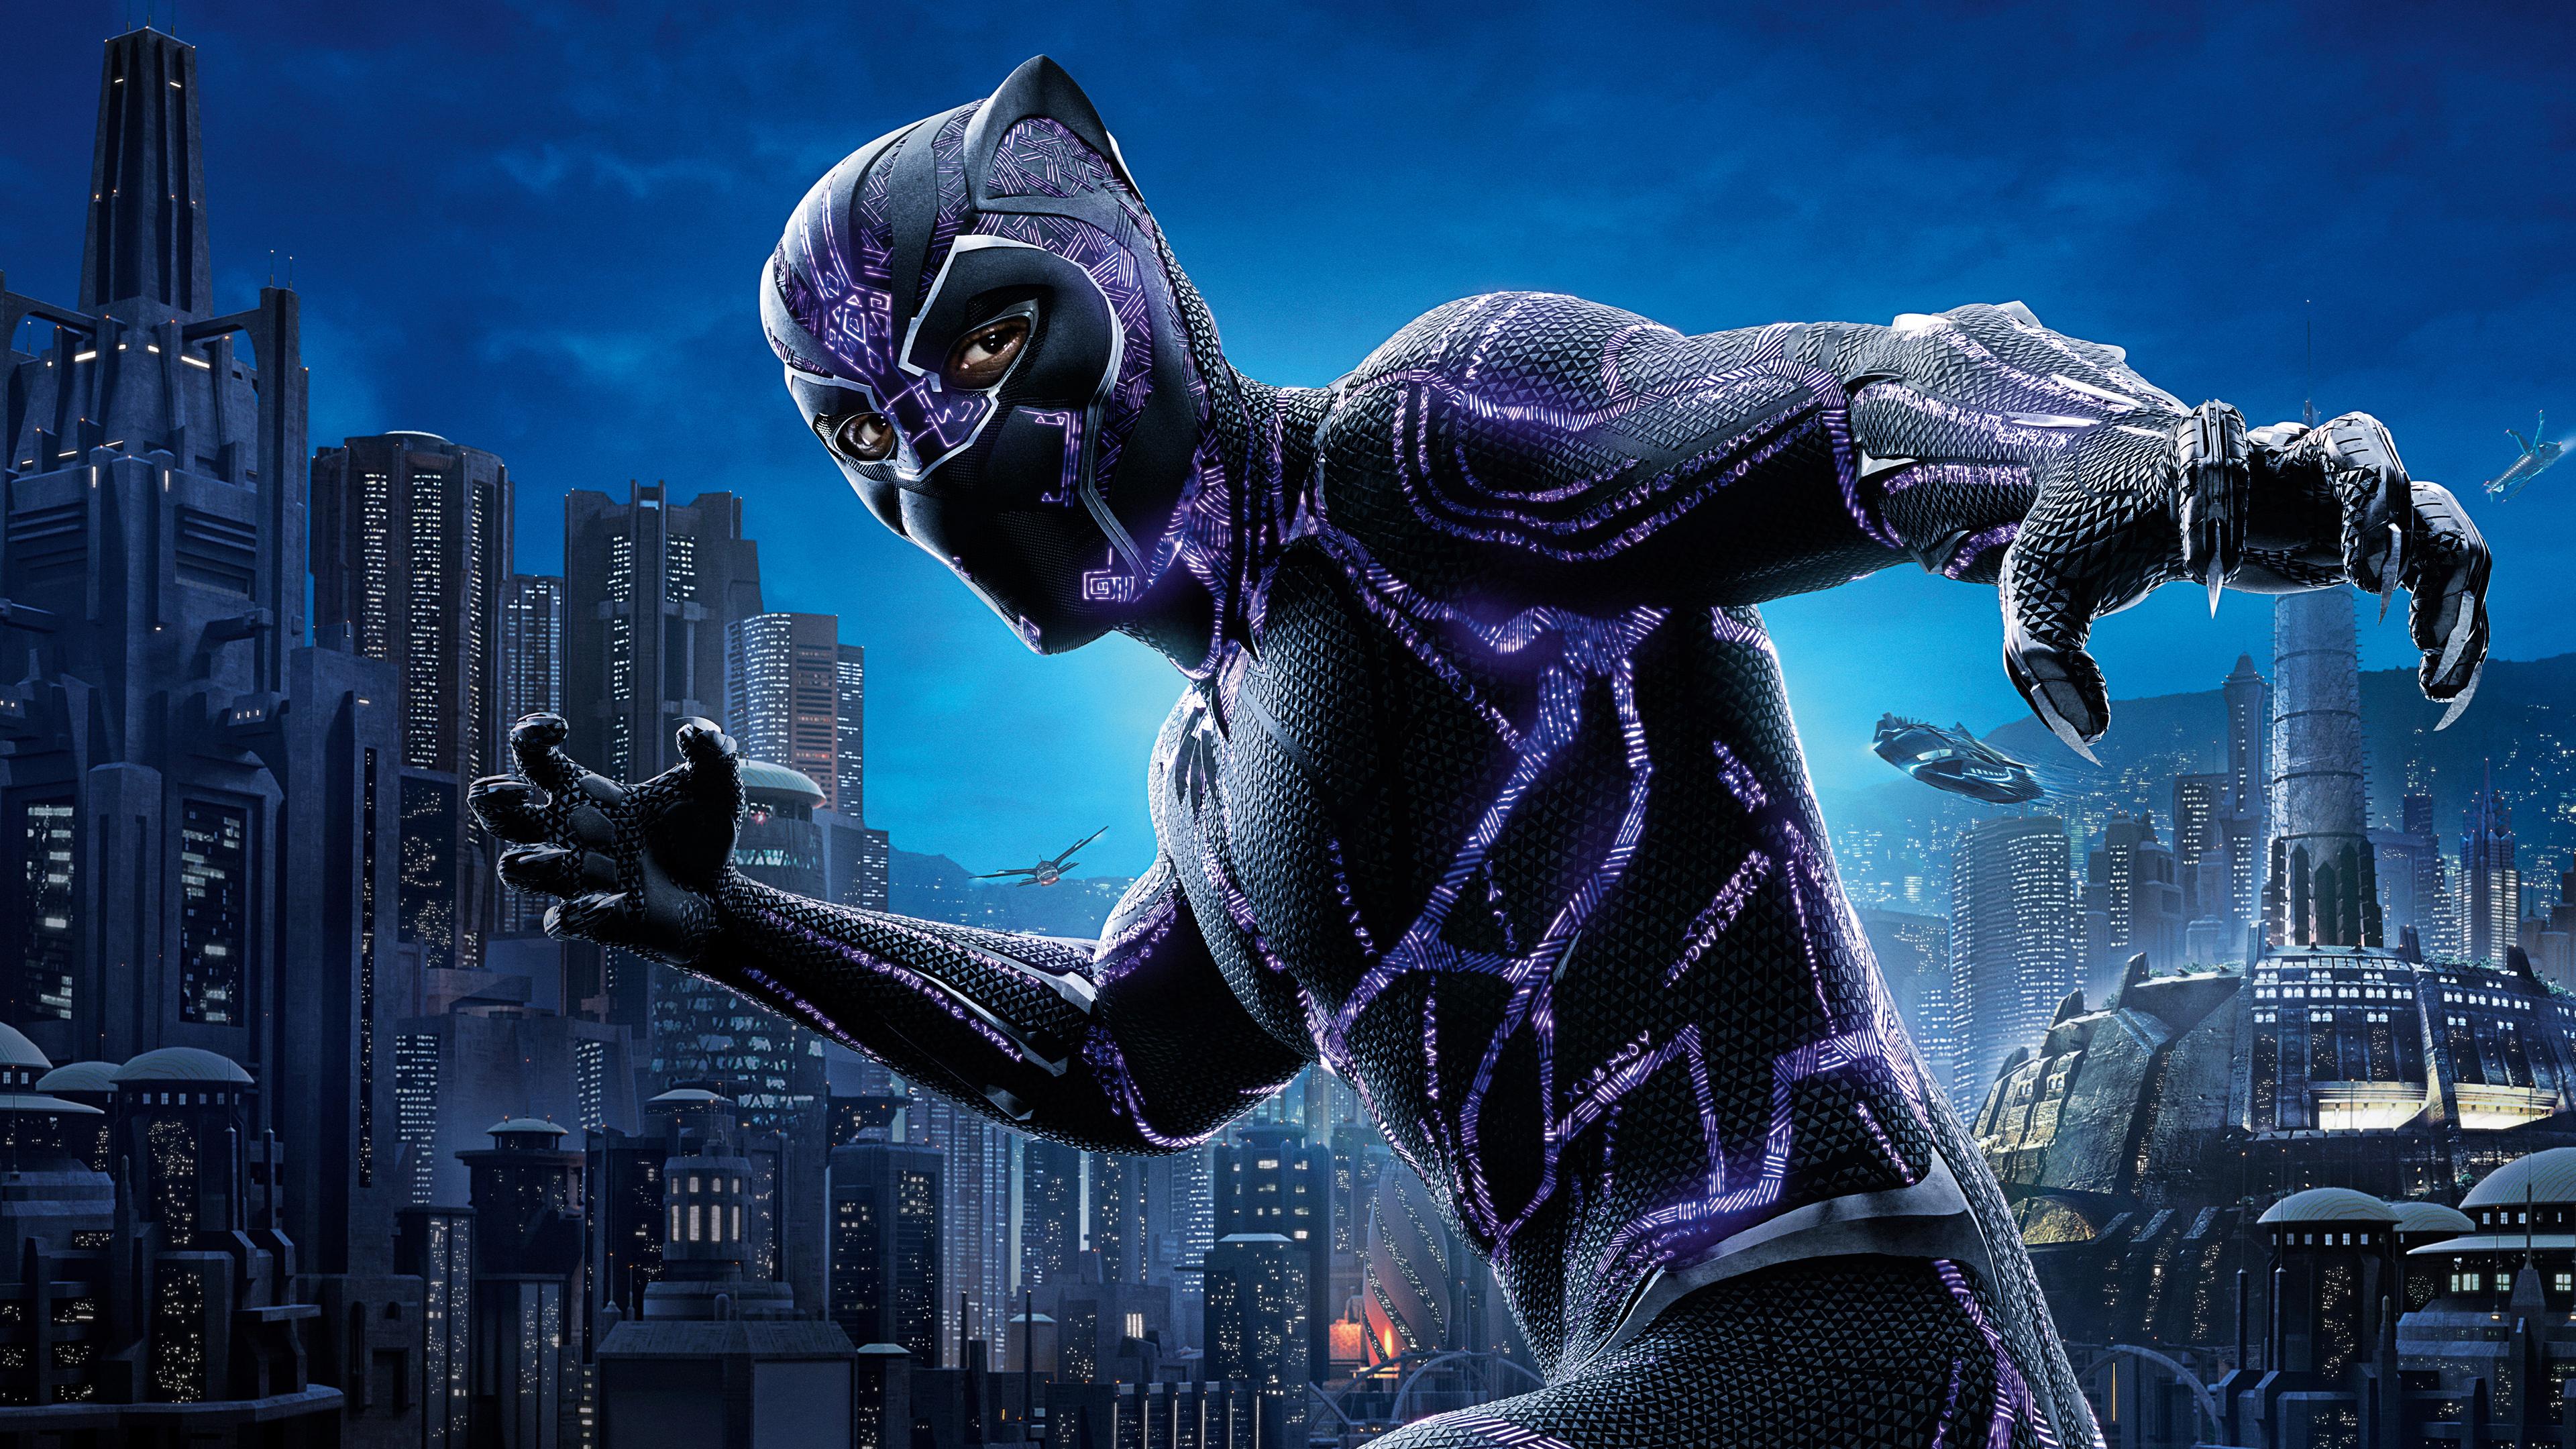 3840x2160 Black Panther 4k Movie Poster 2018 4k HD 4k ...